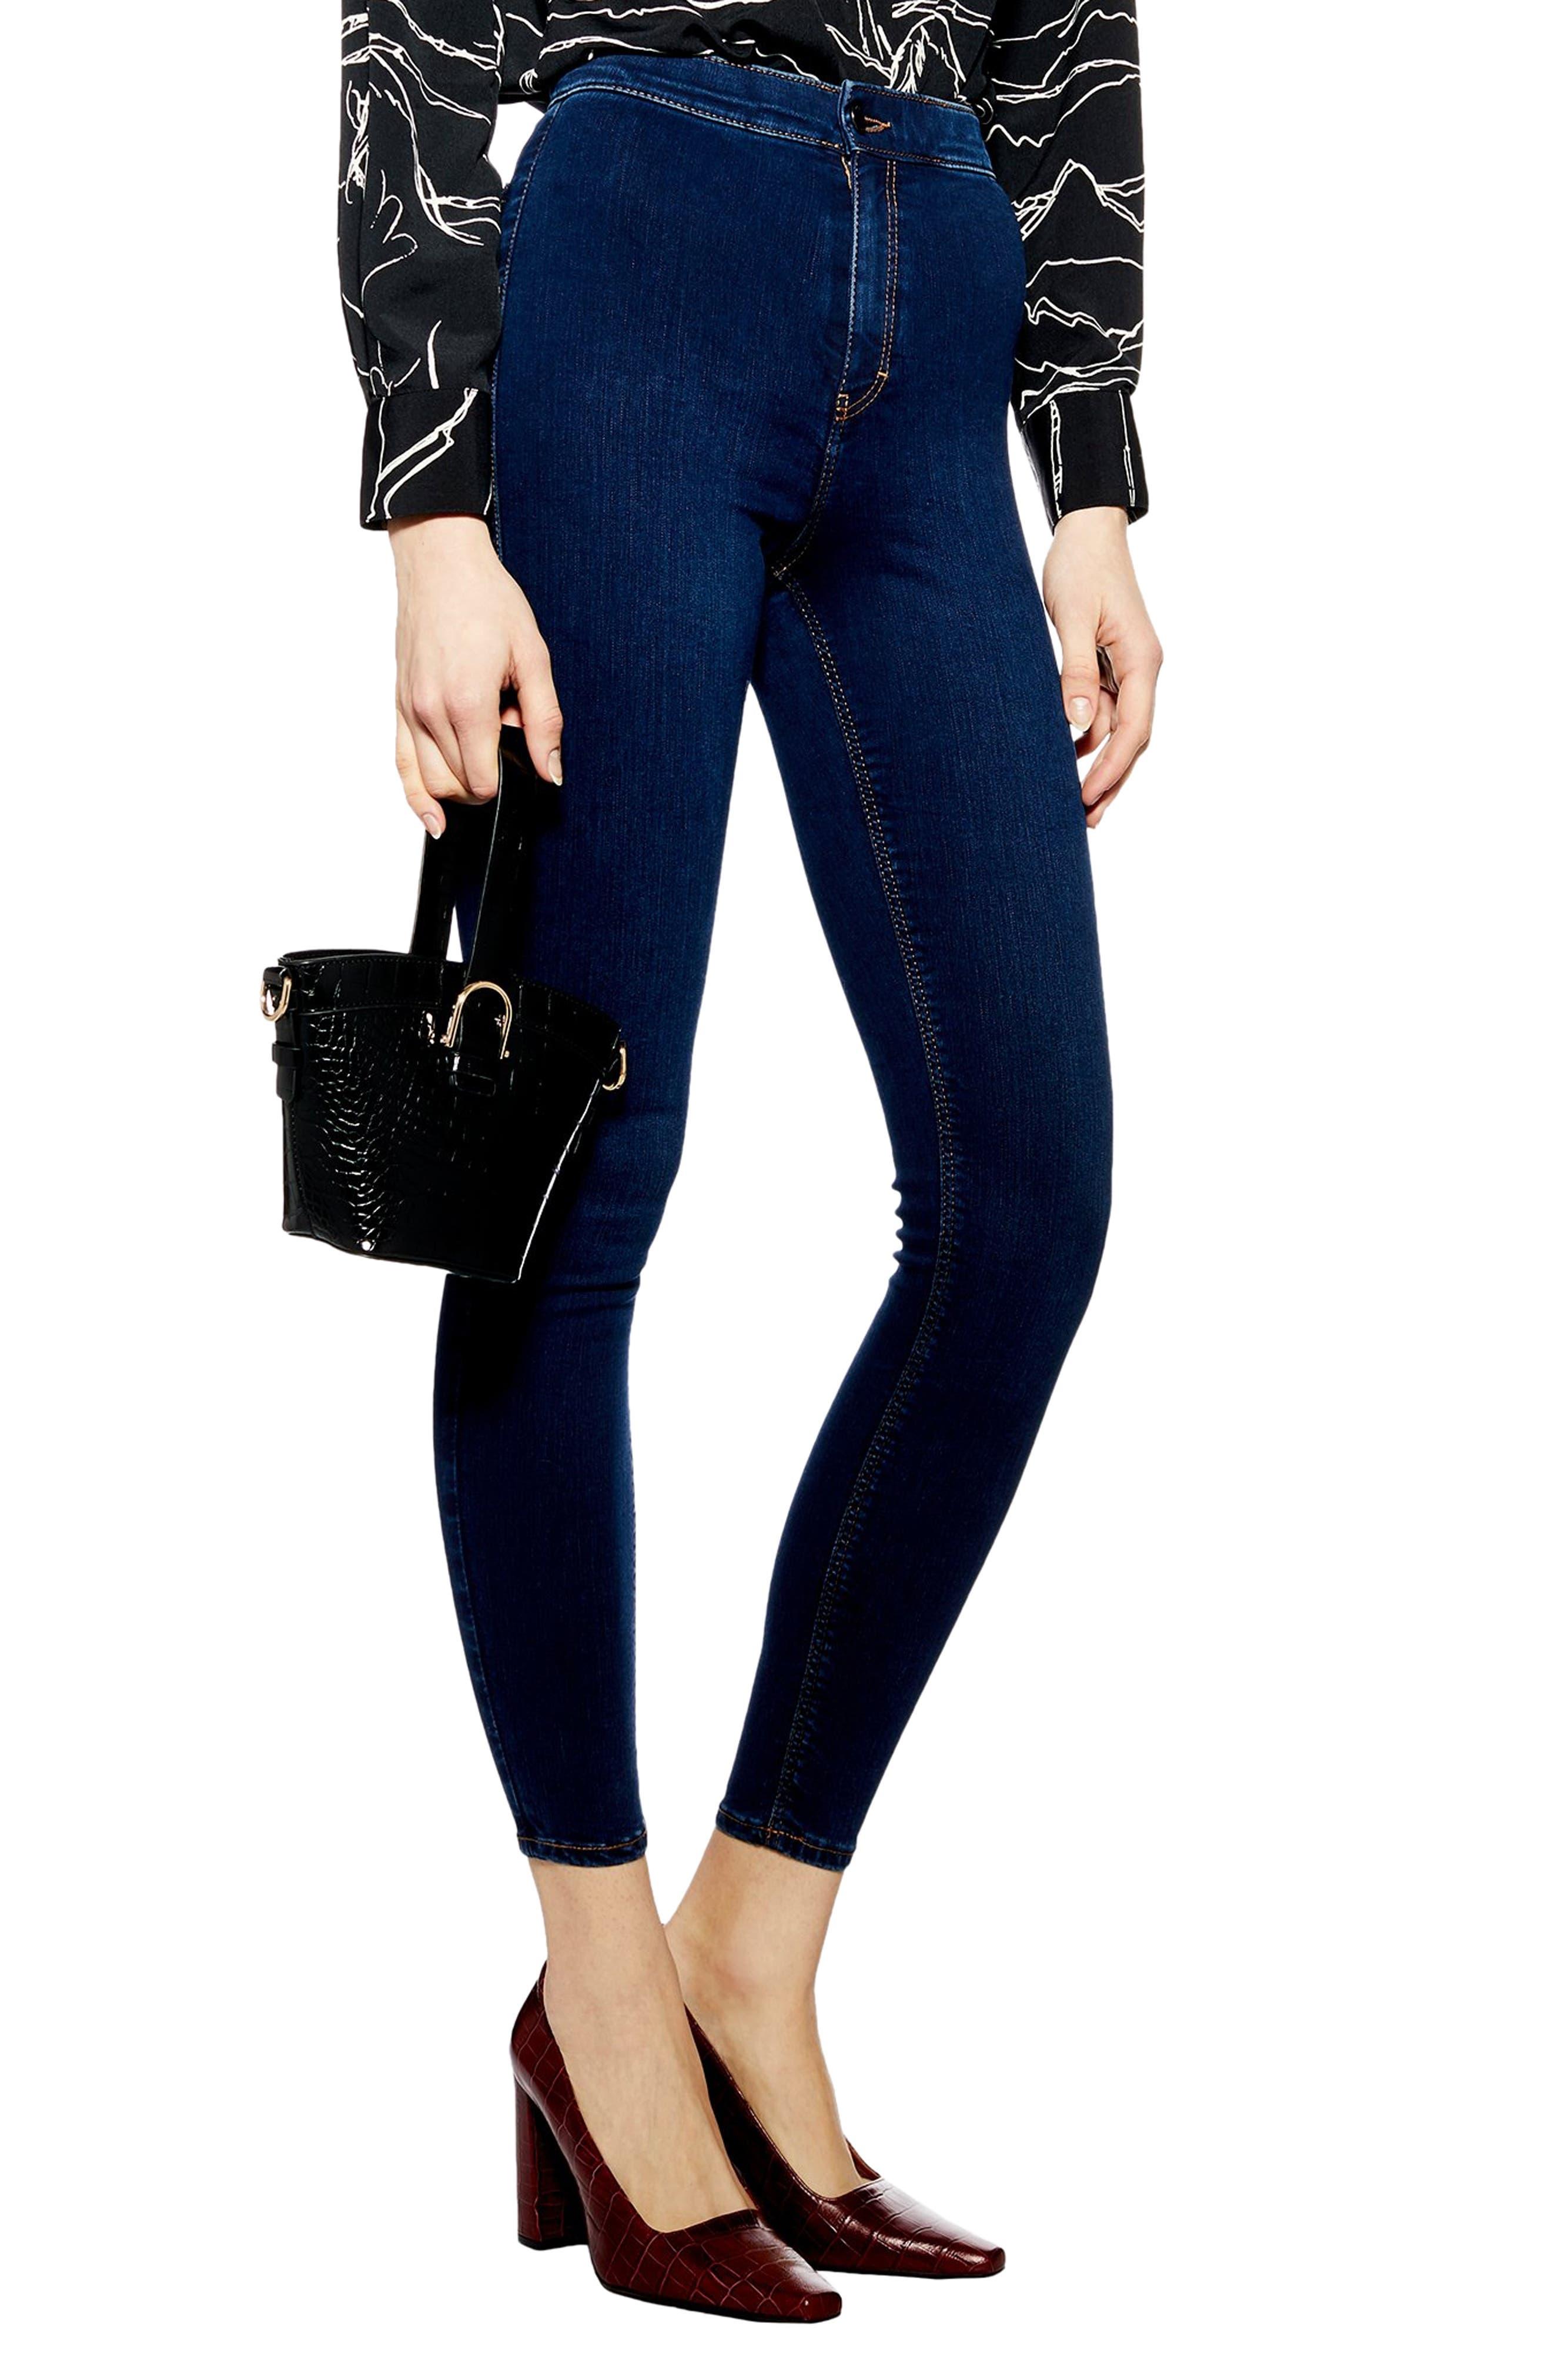 Topshop Joni High Waist Jeans (Regular & Petite)